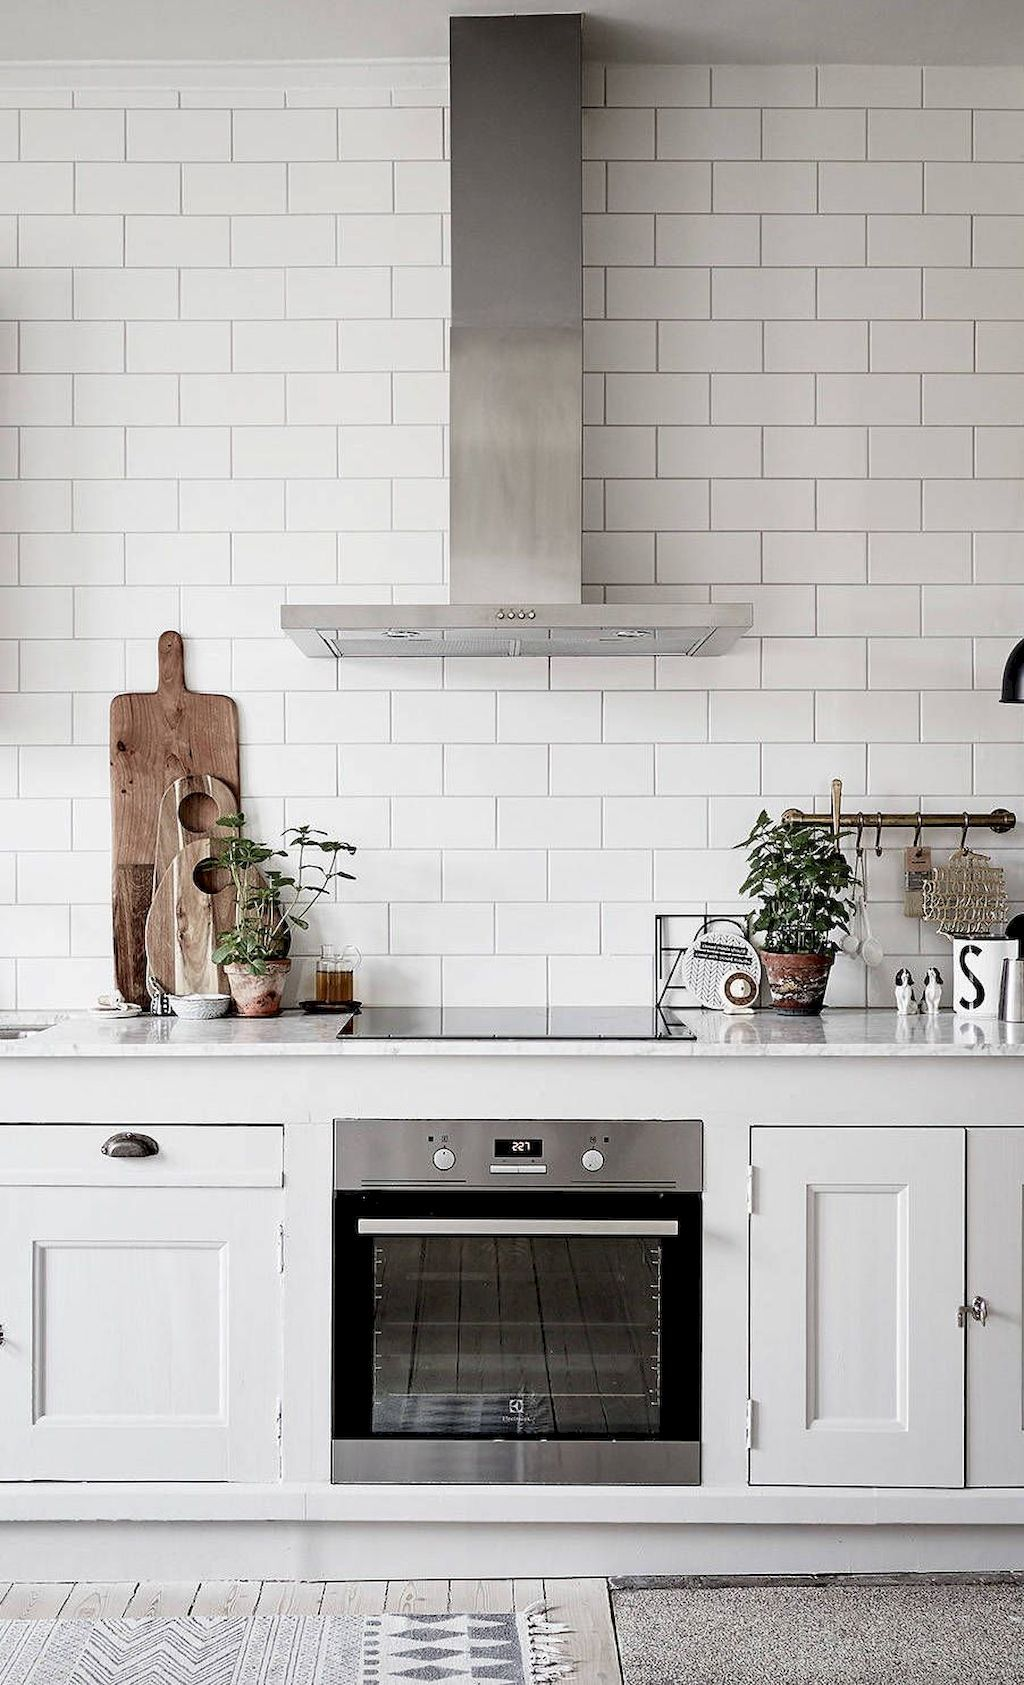 Best Scandinavian Backsplash Ideas For A Small Kitchen Https Carrebianhome Com Best Scandinavian Backsplash Ideas Kitchen Design Home Kitchens Kitchen Style